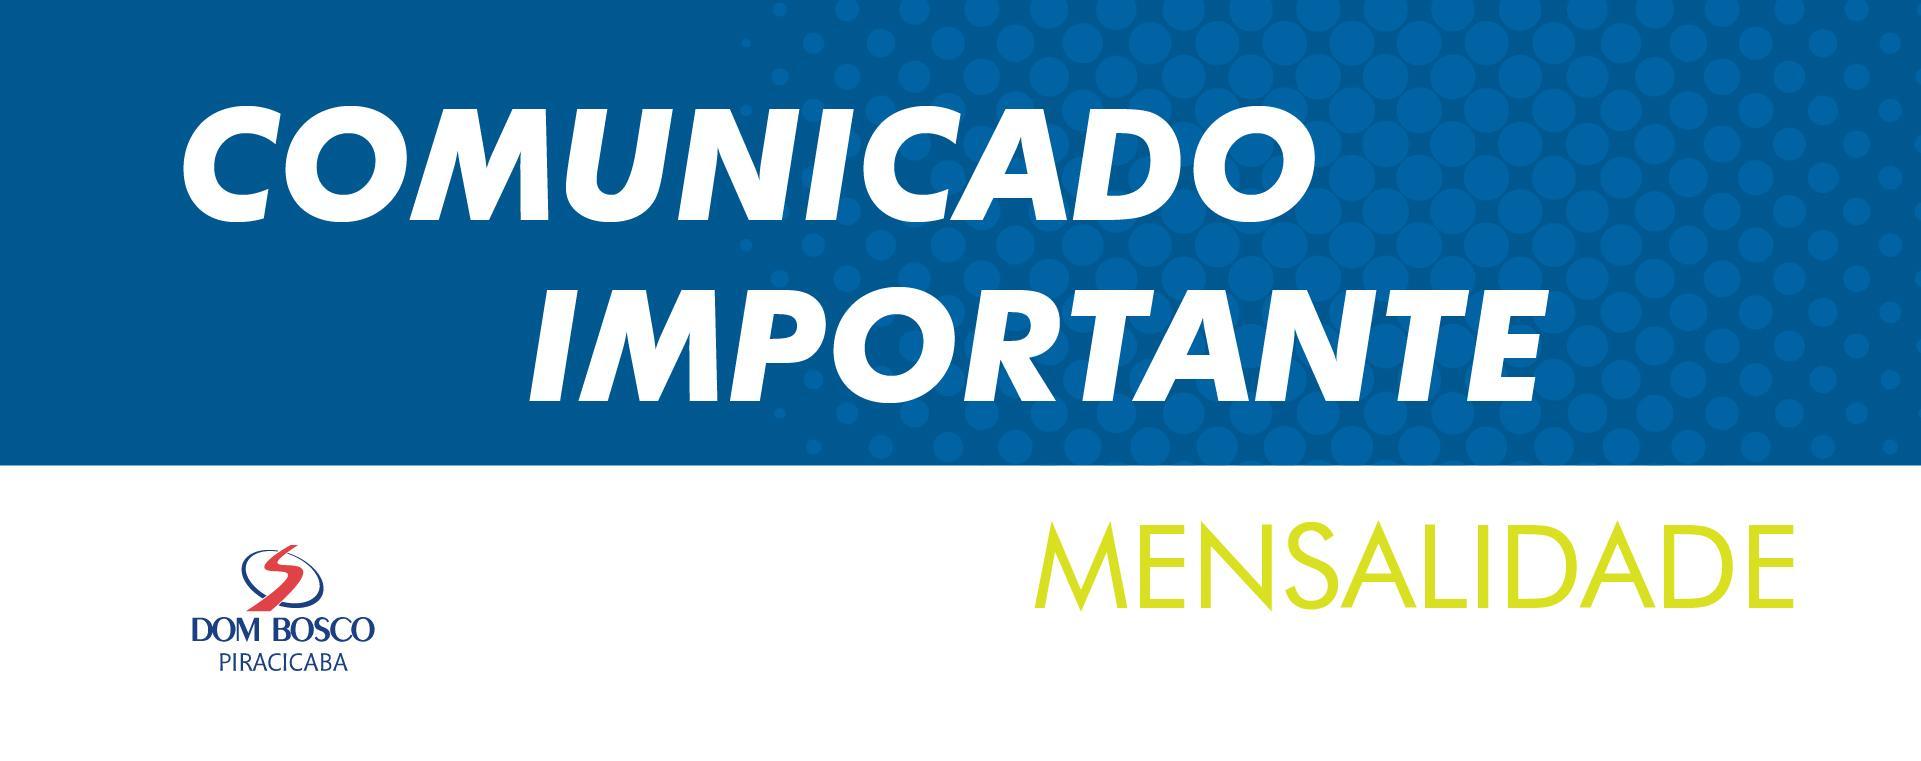 images/2020/05/115-fullhd-comunicado-mensalidade.jpg